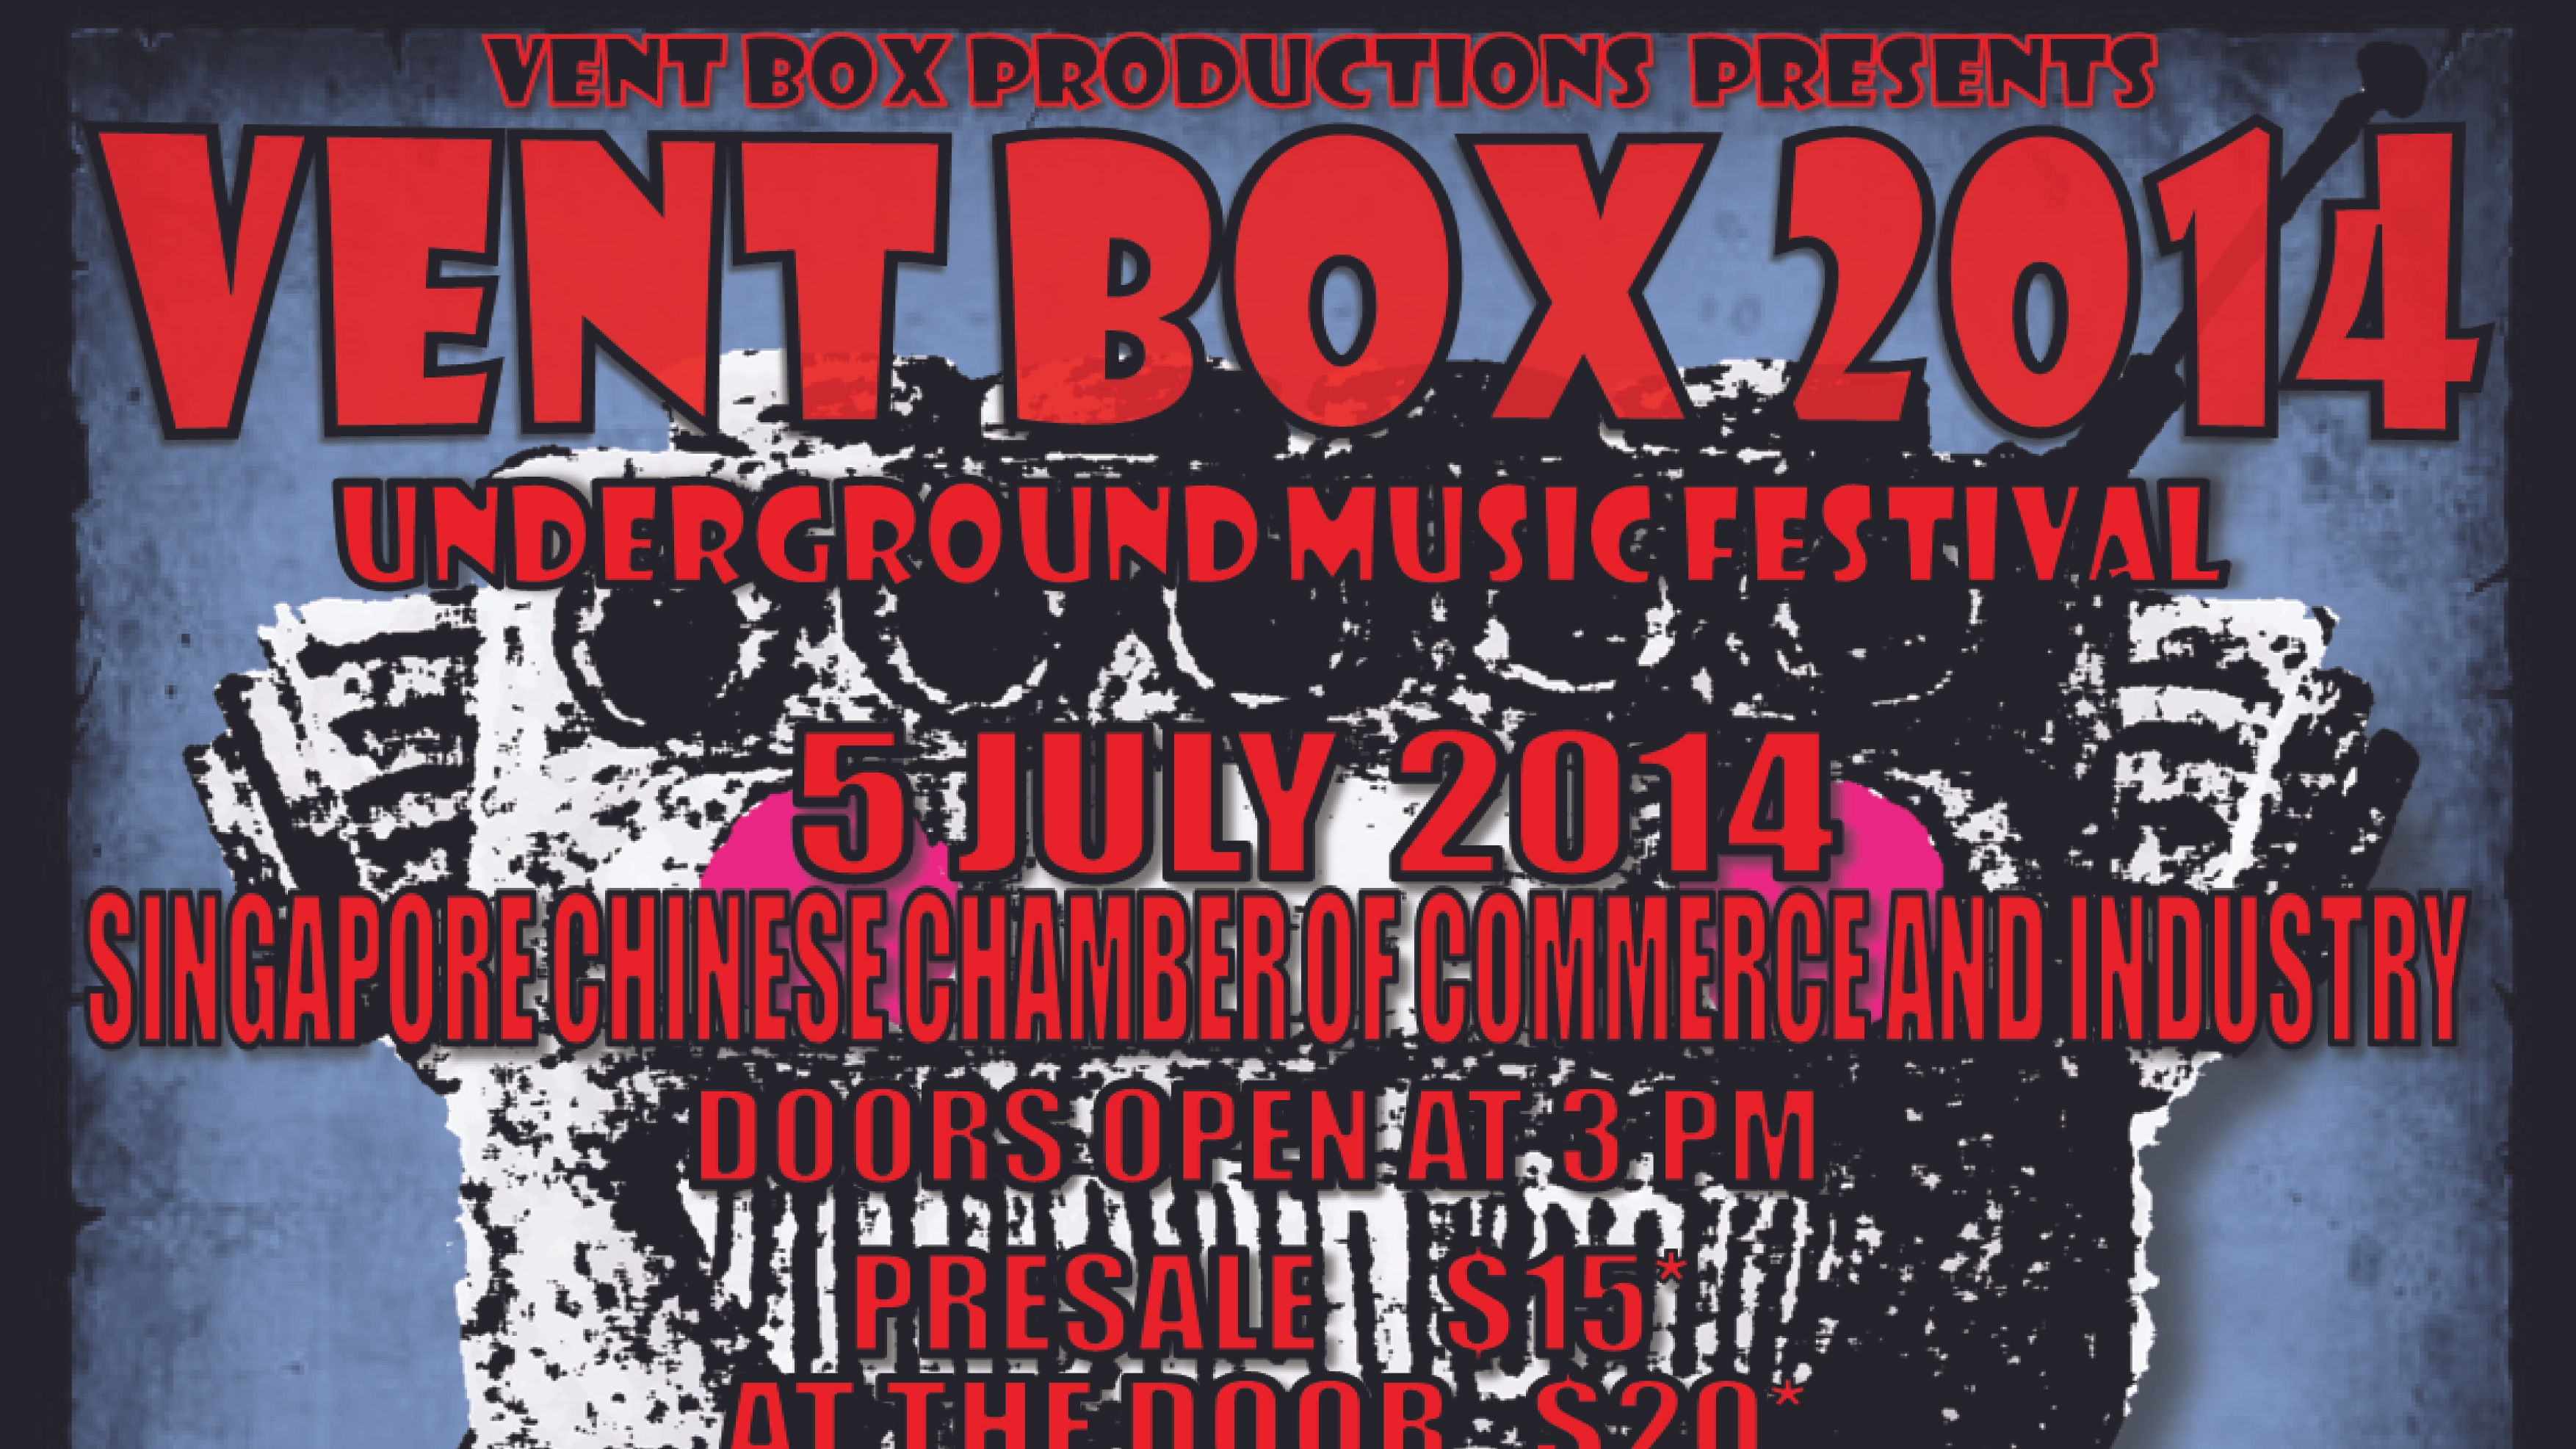 Vent Box 2014 Underground Music Festival